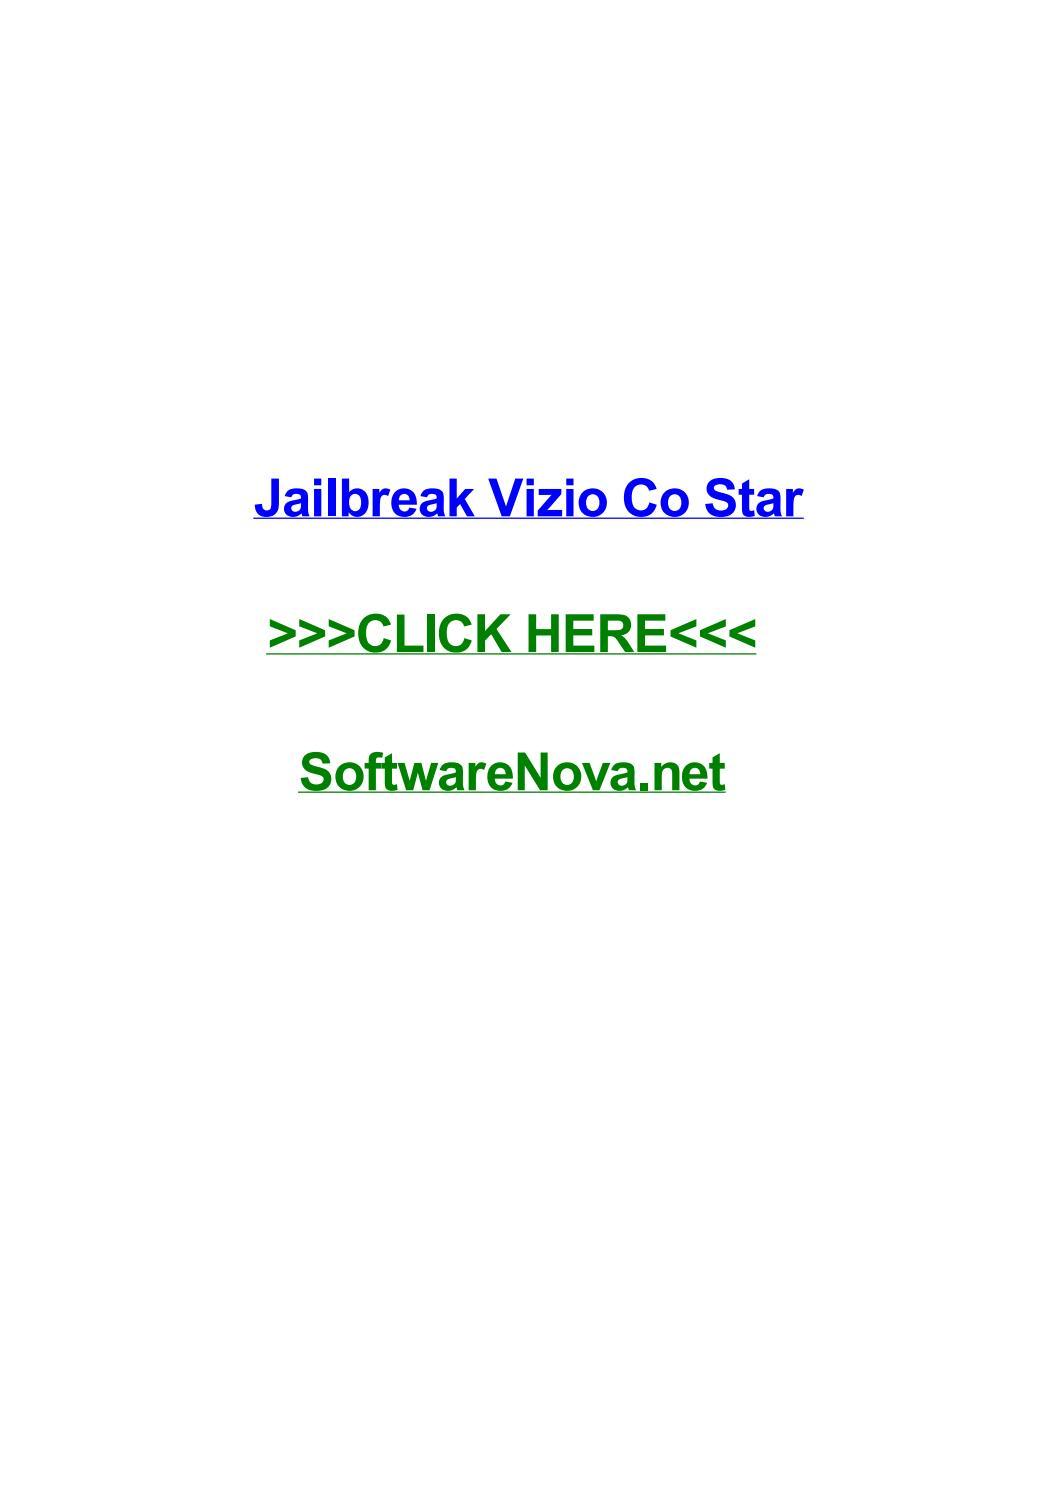 Jailbreak vizio co star by johndozxt - issuu